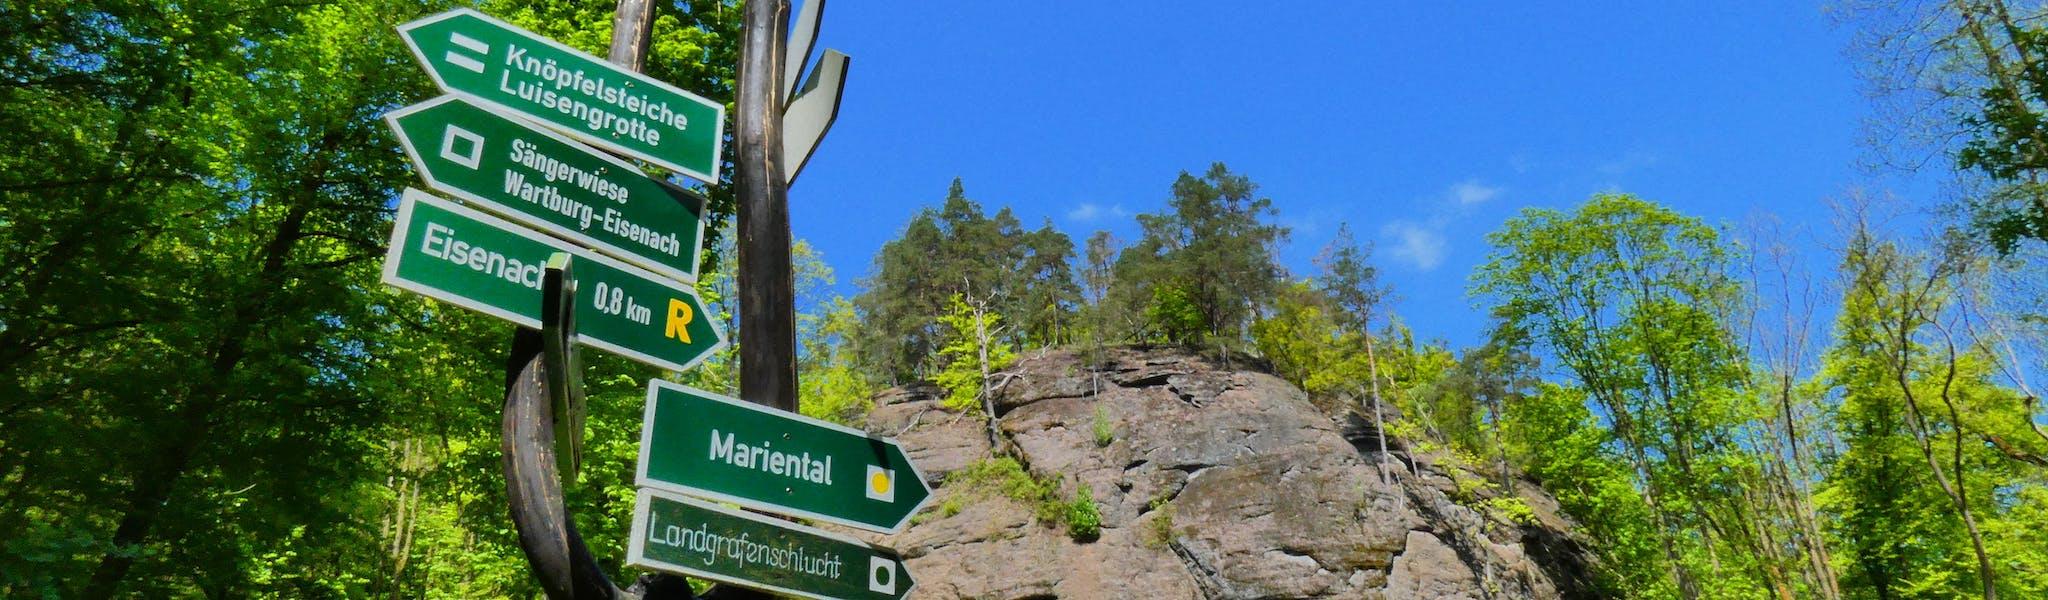 Ingang naar Drachenschlucht bij Eisenach Renn